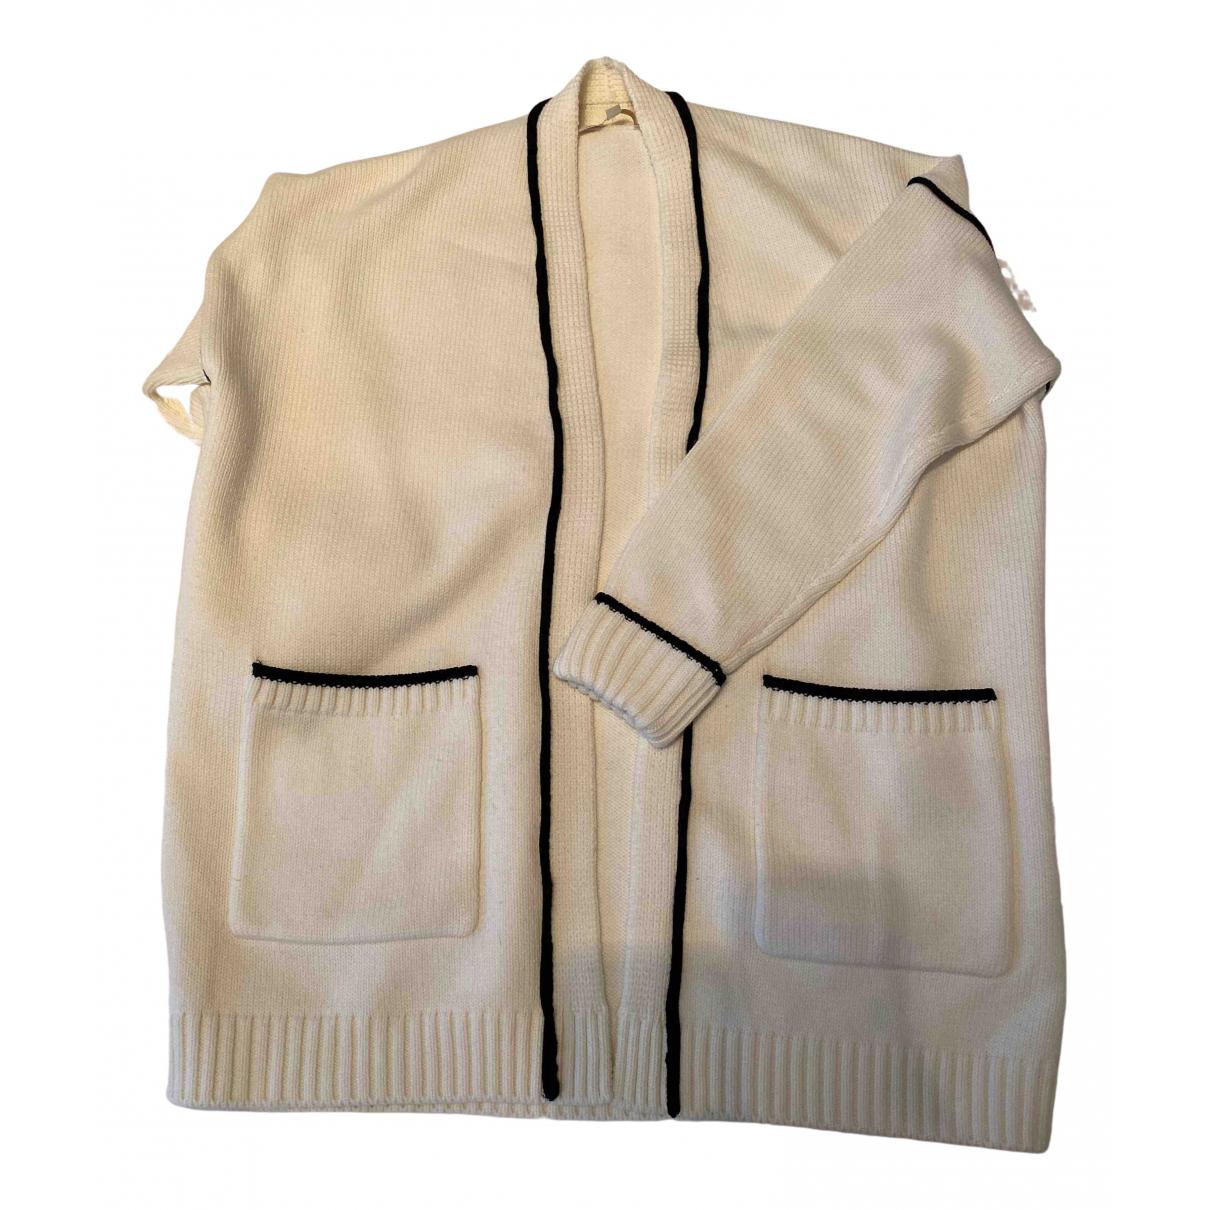 Maje - Pull Fall Winter 2019 pour femme en laine - blanc